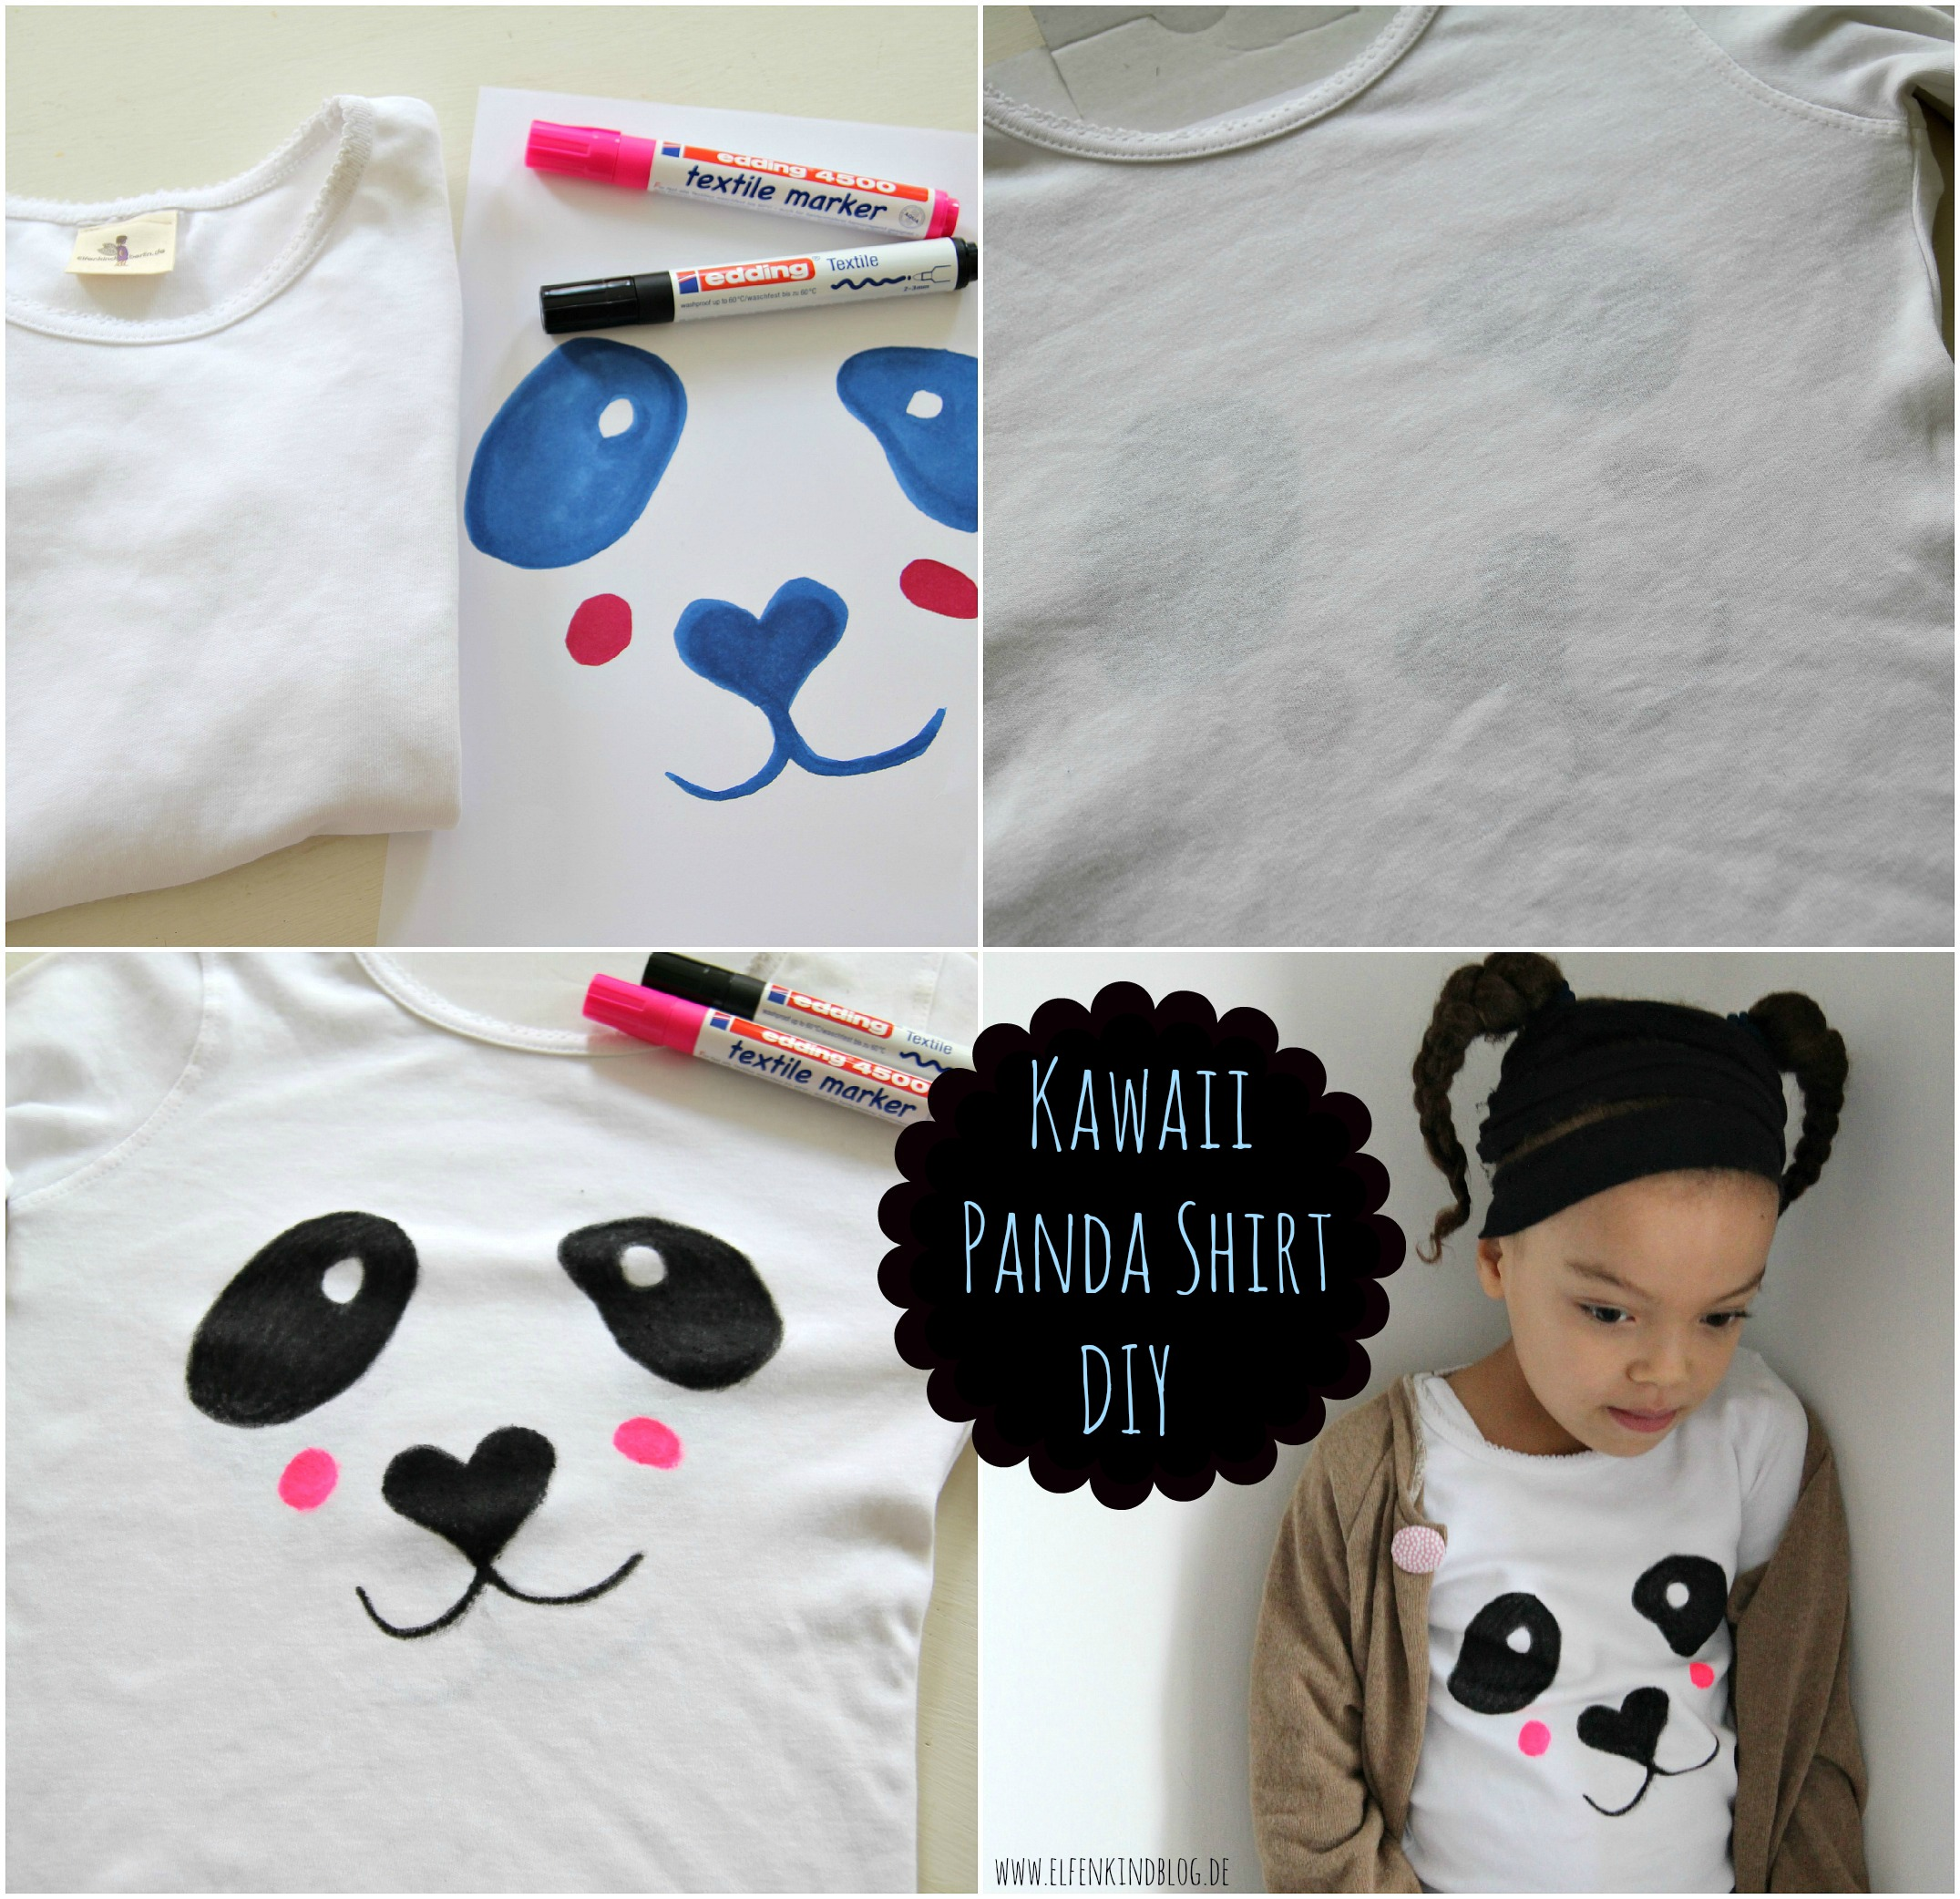 Kawaii Panda Shirt Diy Und Give Away Mamablog Shop By Elfenkind